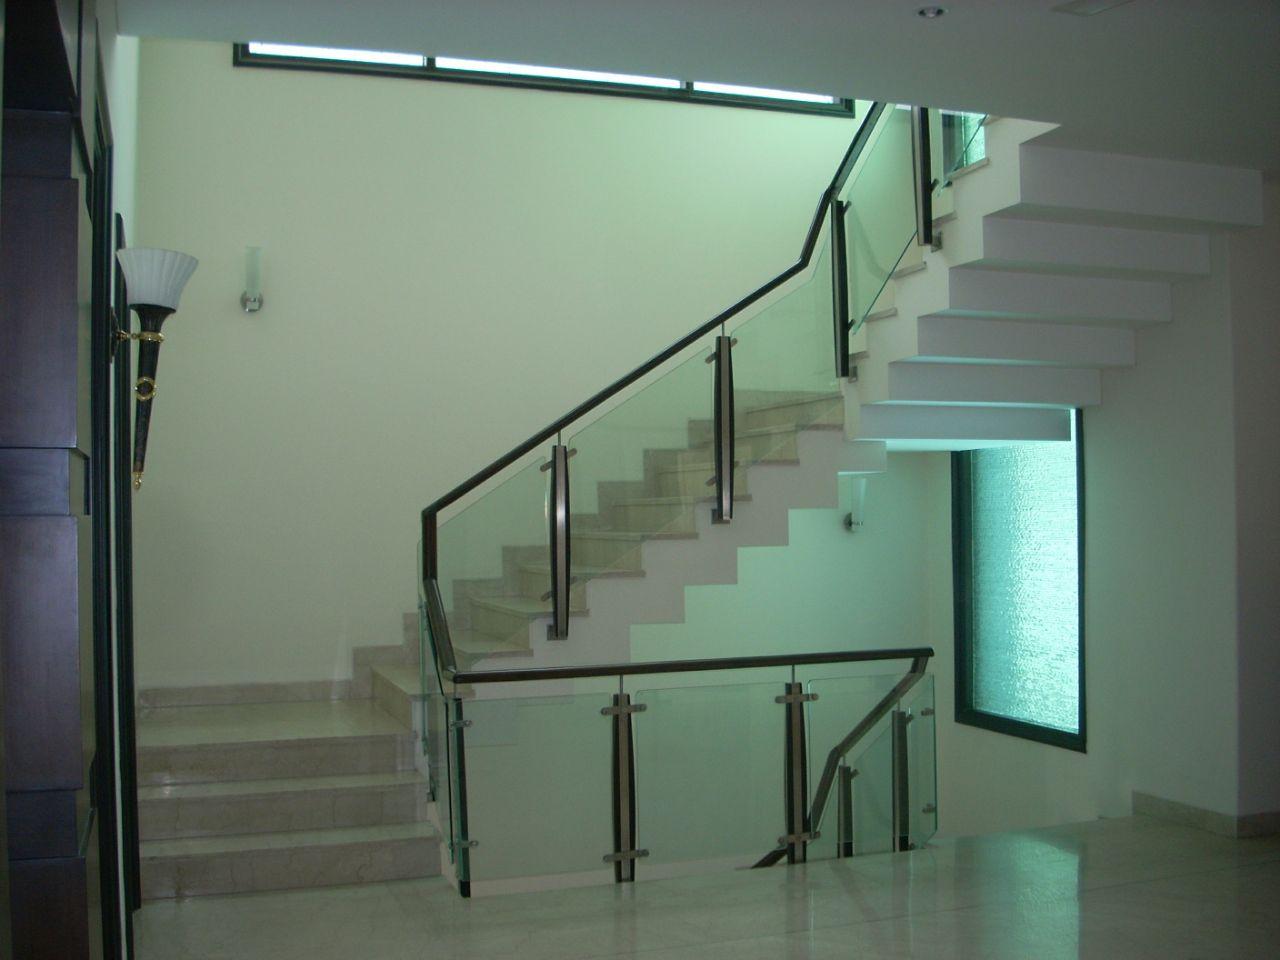 White Themed Staircase Decor by Madhu Kailashi Indoor-spaces Modern   Interior Design Photos & Ideas